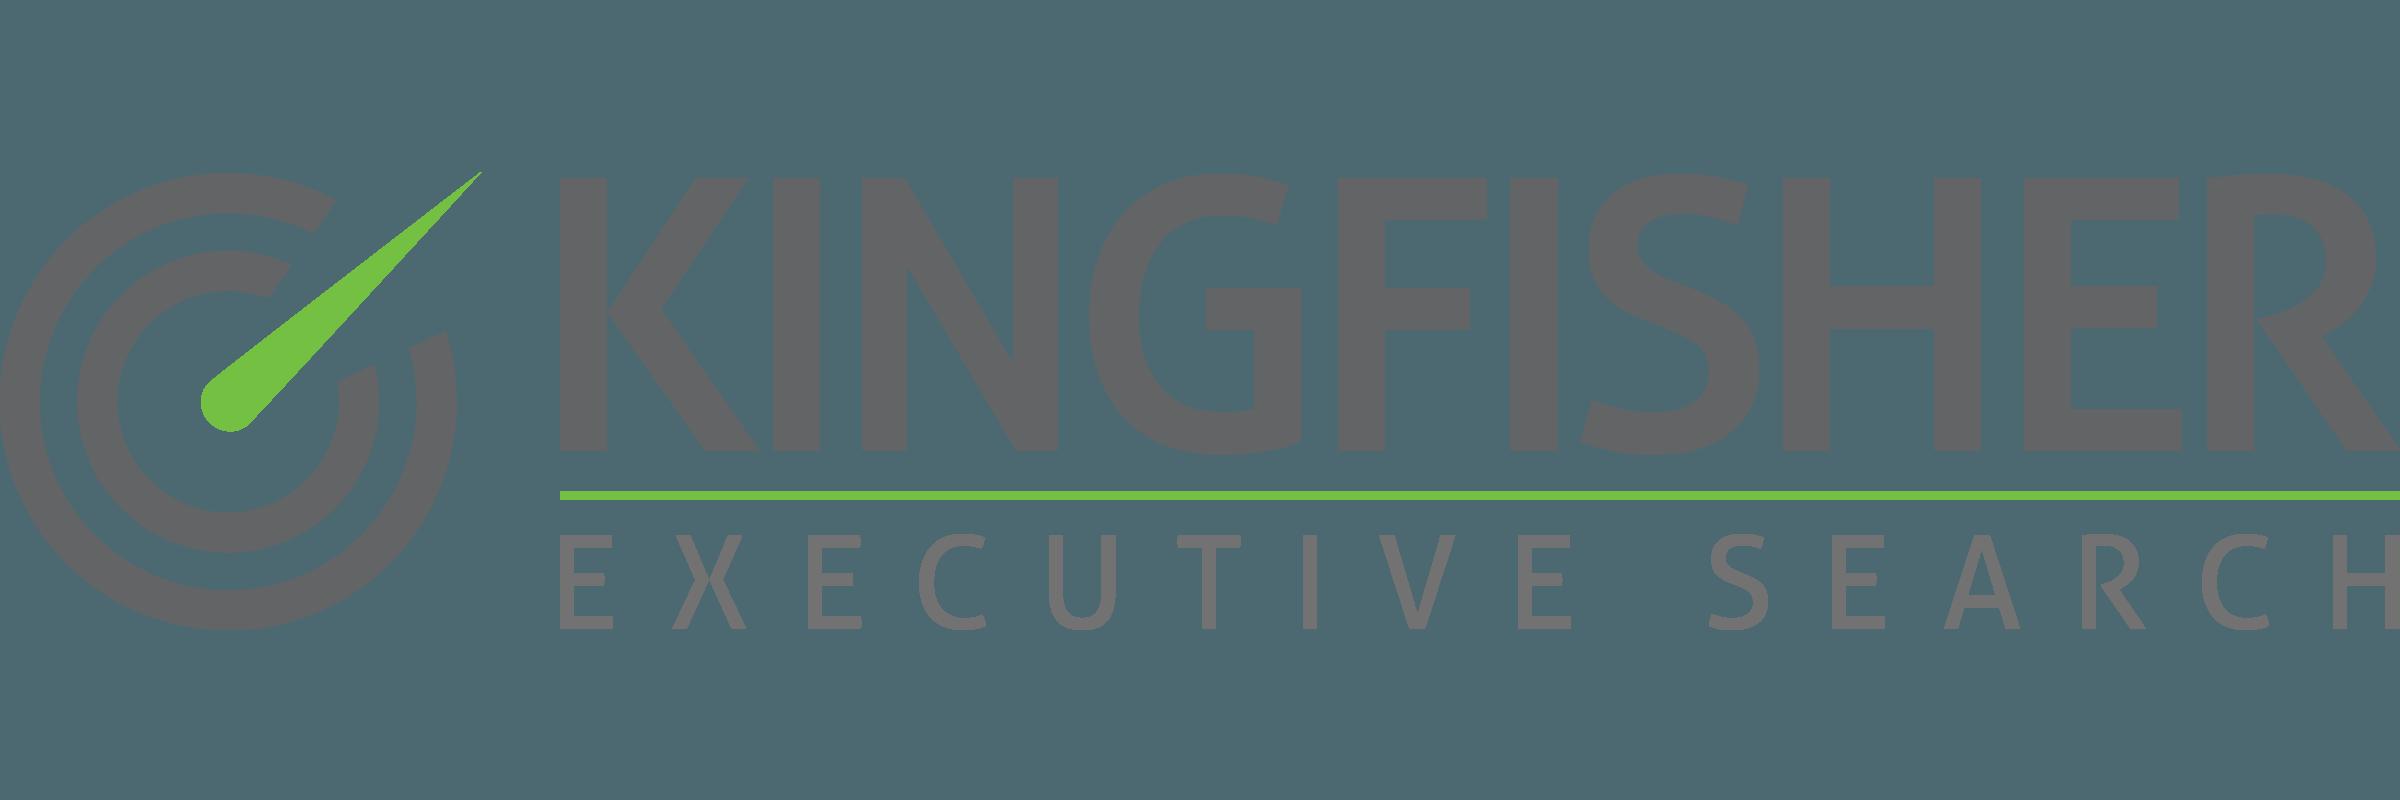 Kingfisher Executive Search